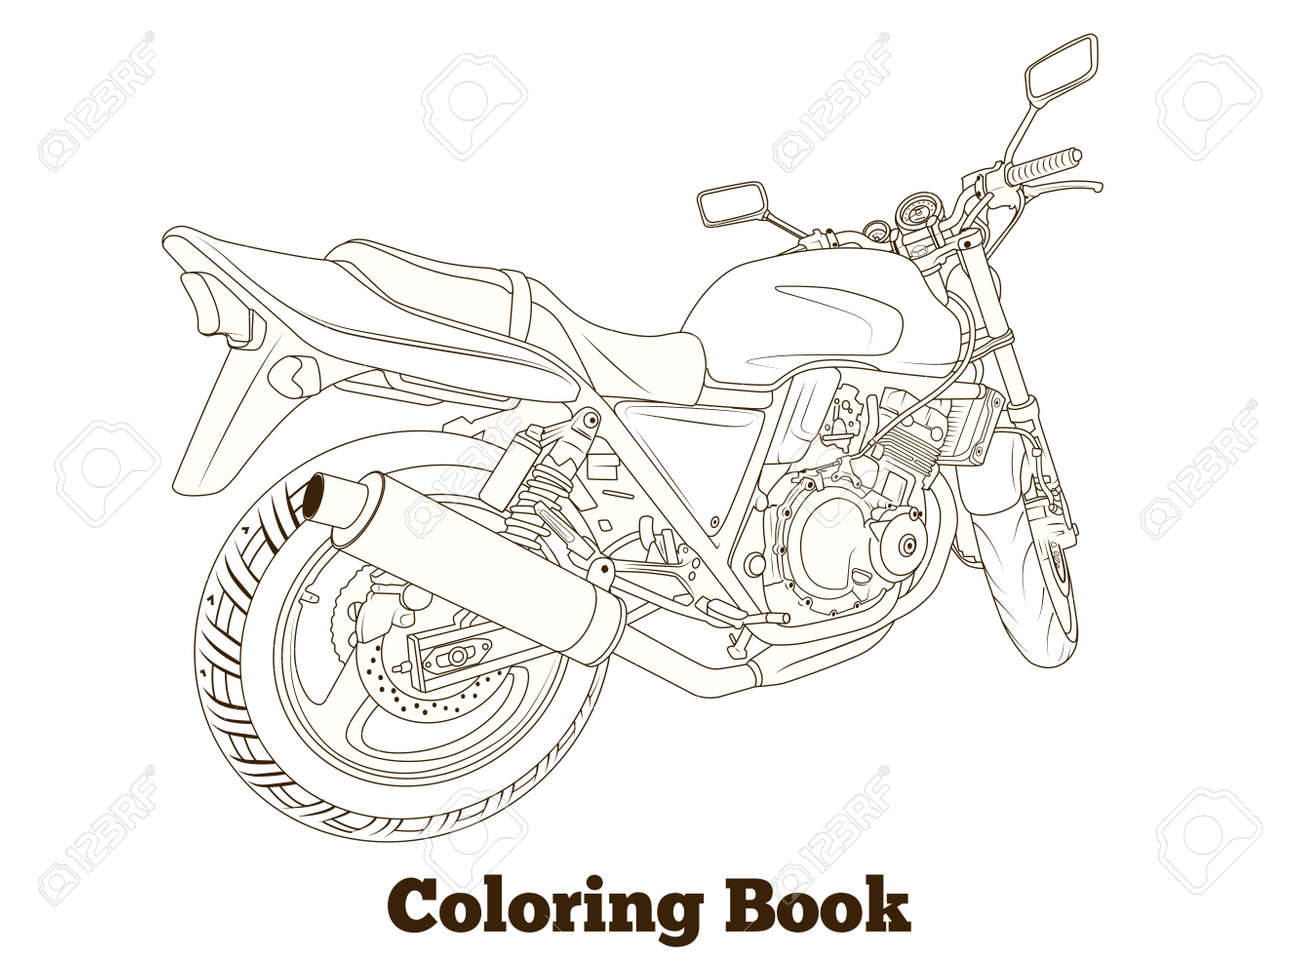 Malbuch Motorrad Dünne Linien Vektor-Illustration Lizenzfrei ...